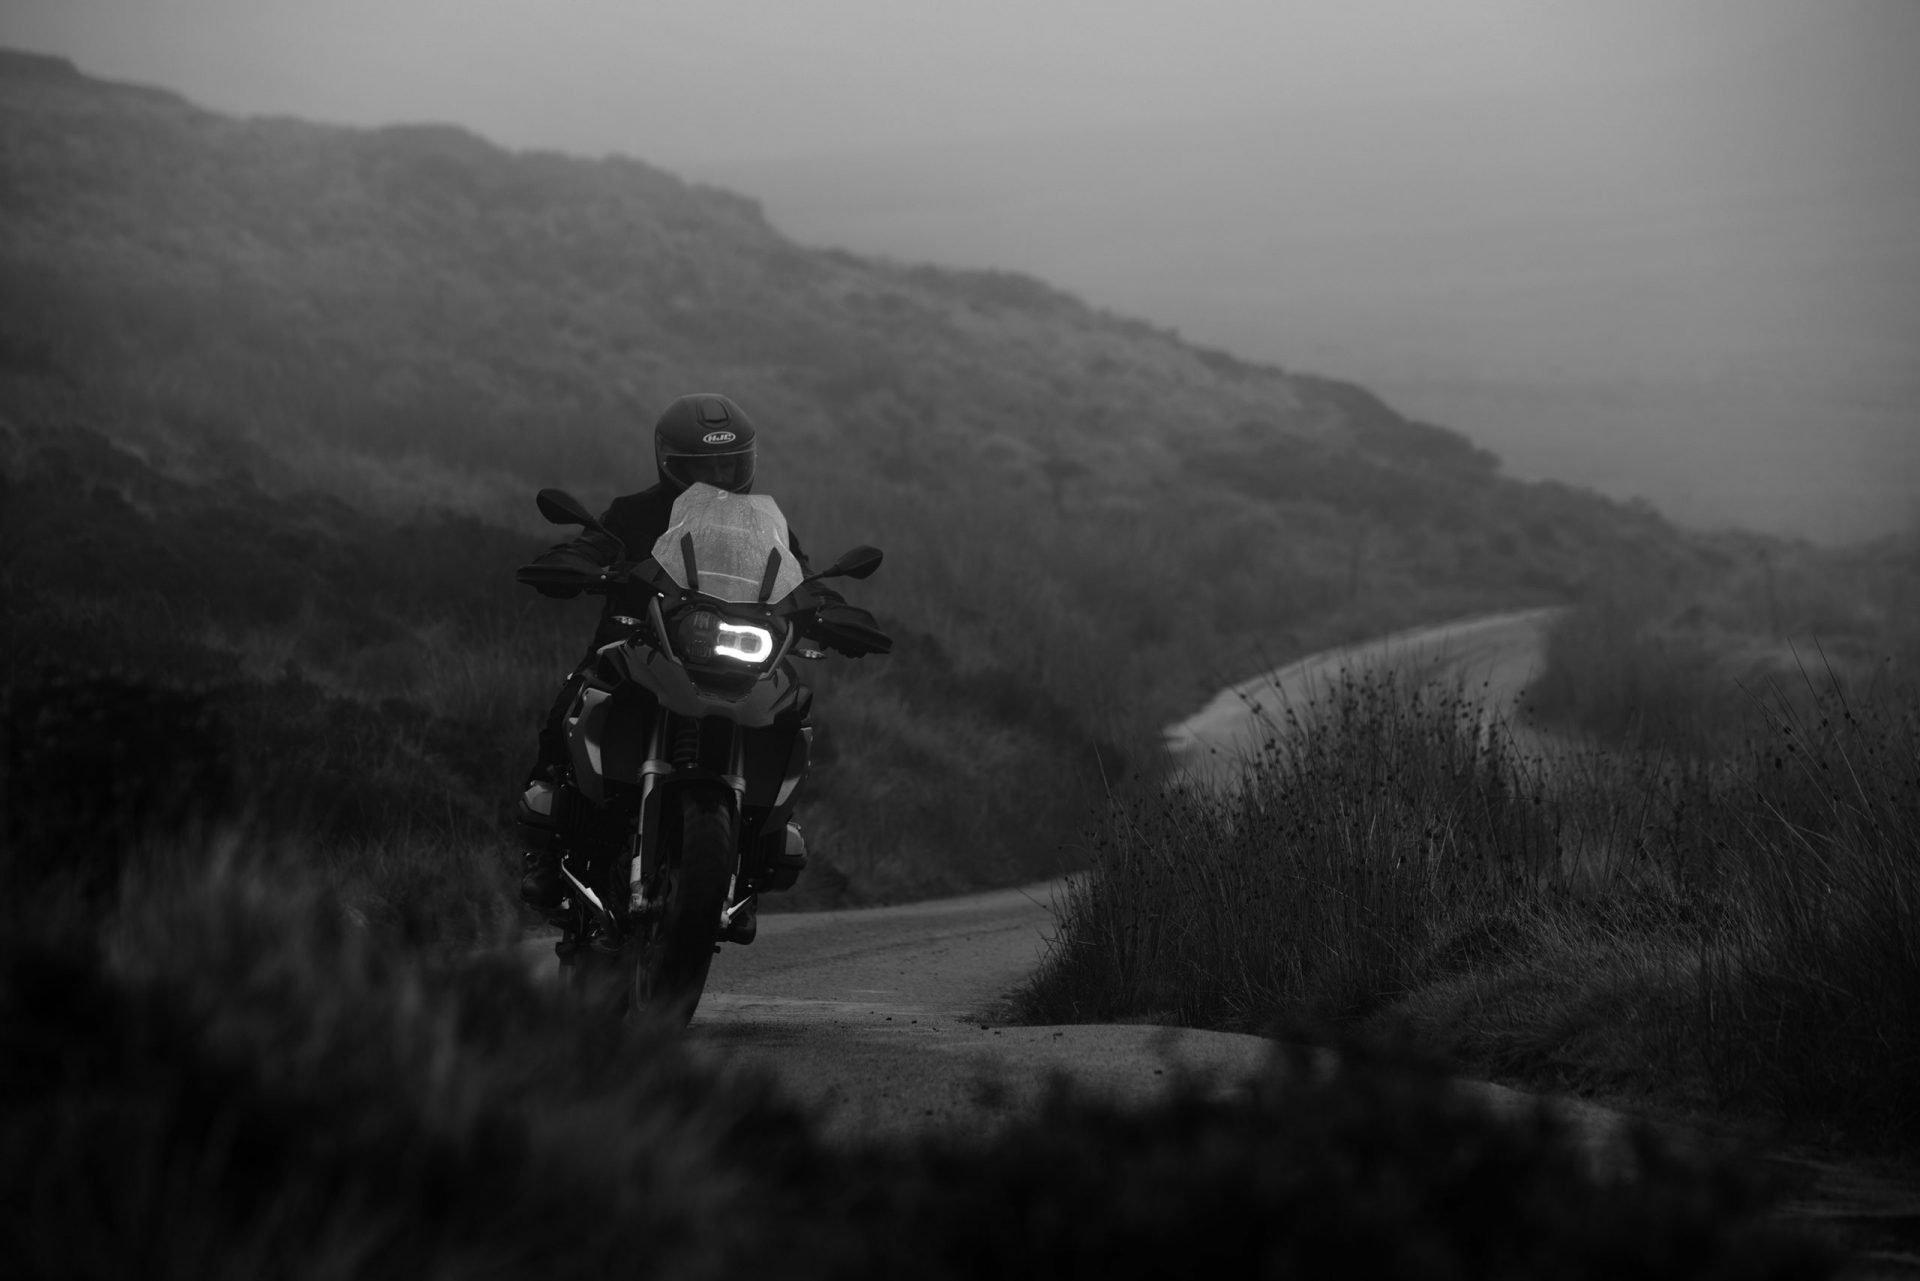 Mondial_Black_Green_Wet_2_Greyscale-1-scaled Oxford Riderwear